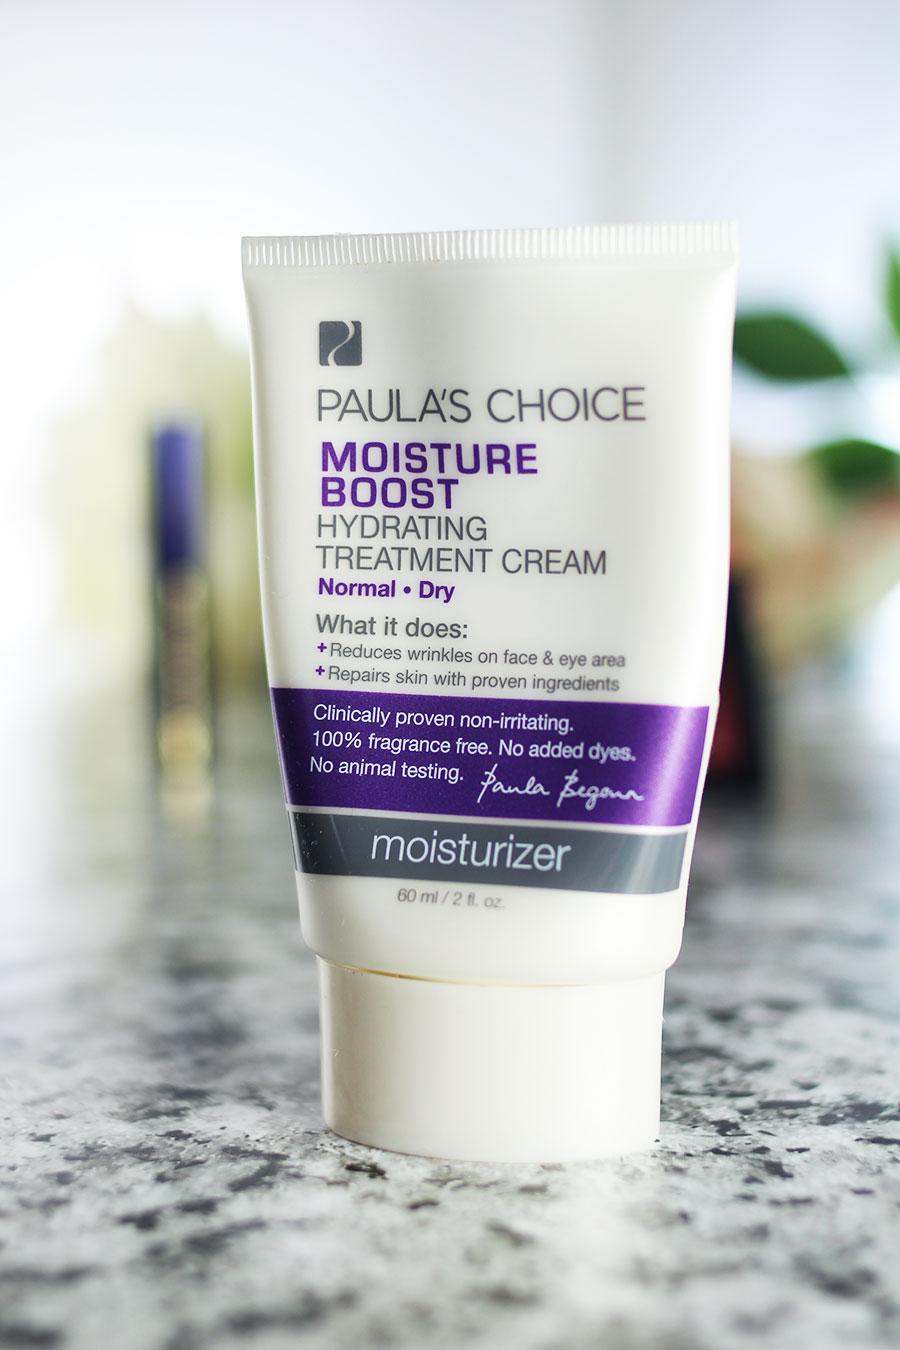 Beauty-Favoriten-1-2016-paulas-choice-moisture-boost-hydrating-treatment-cream